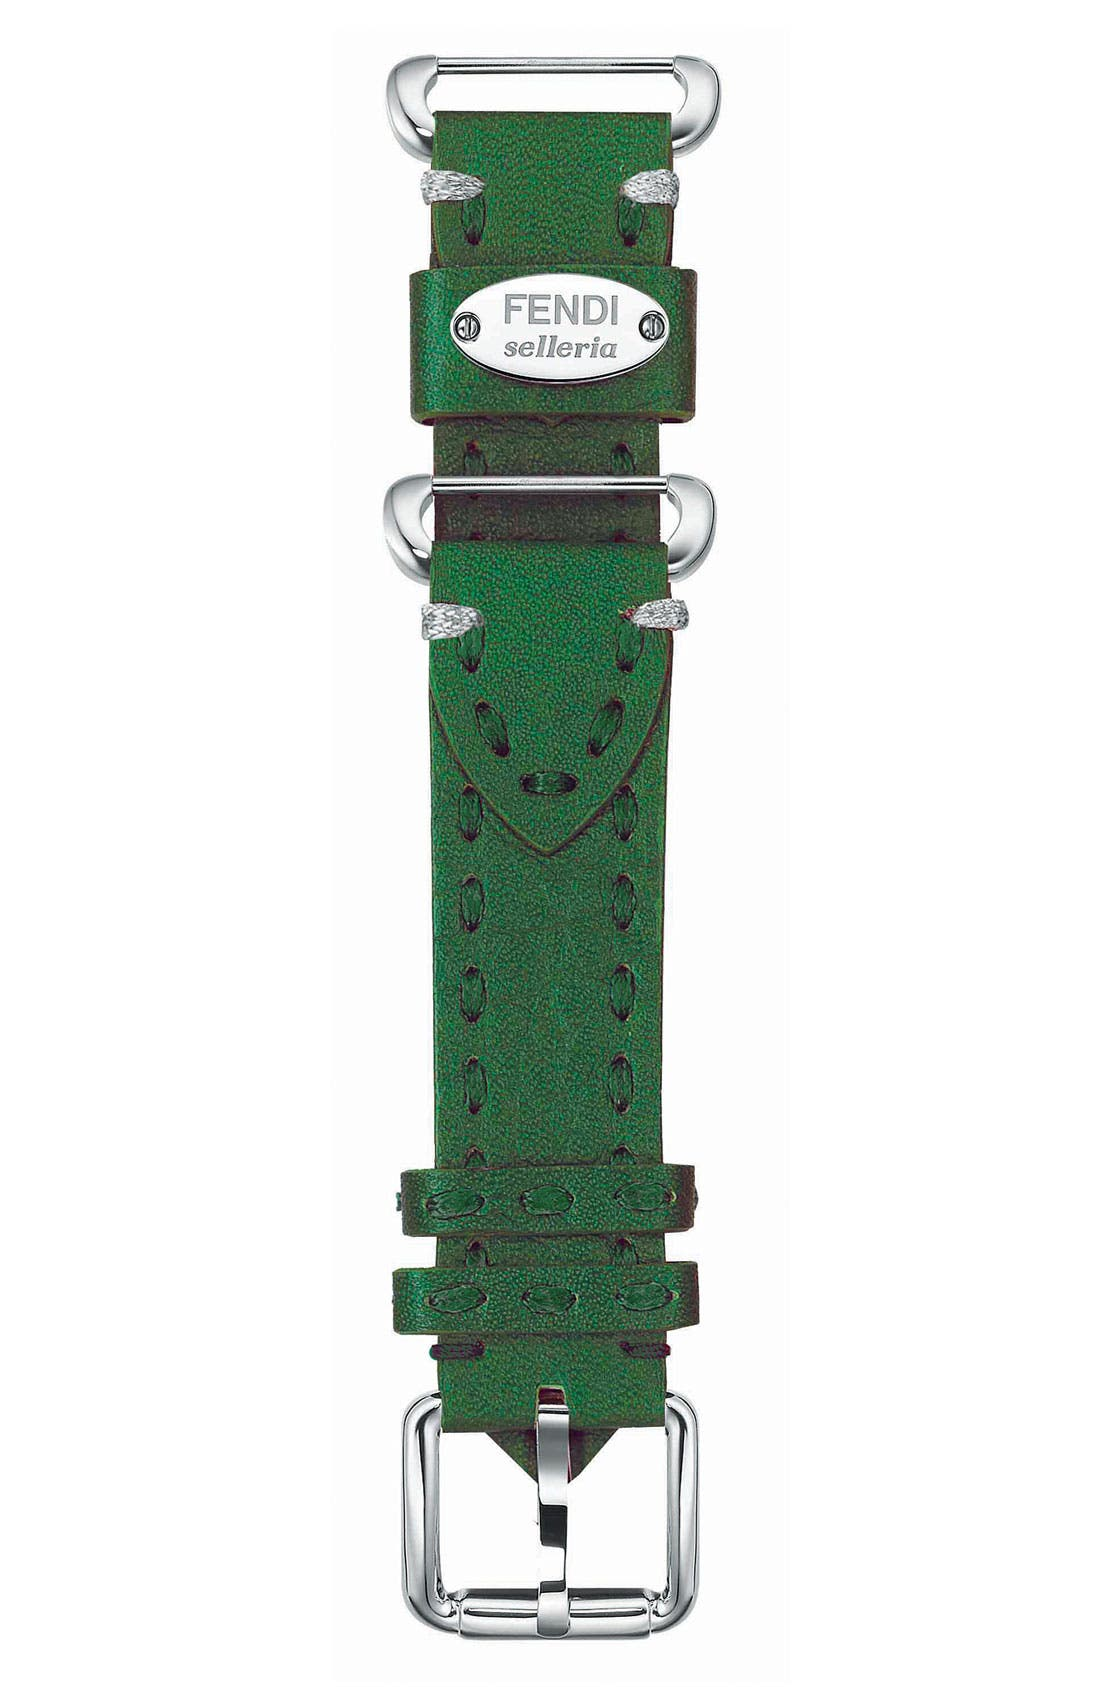 Main Image - Fendi 'Selleria' 18mm Watch Strap